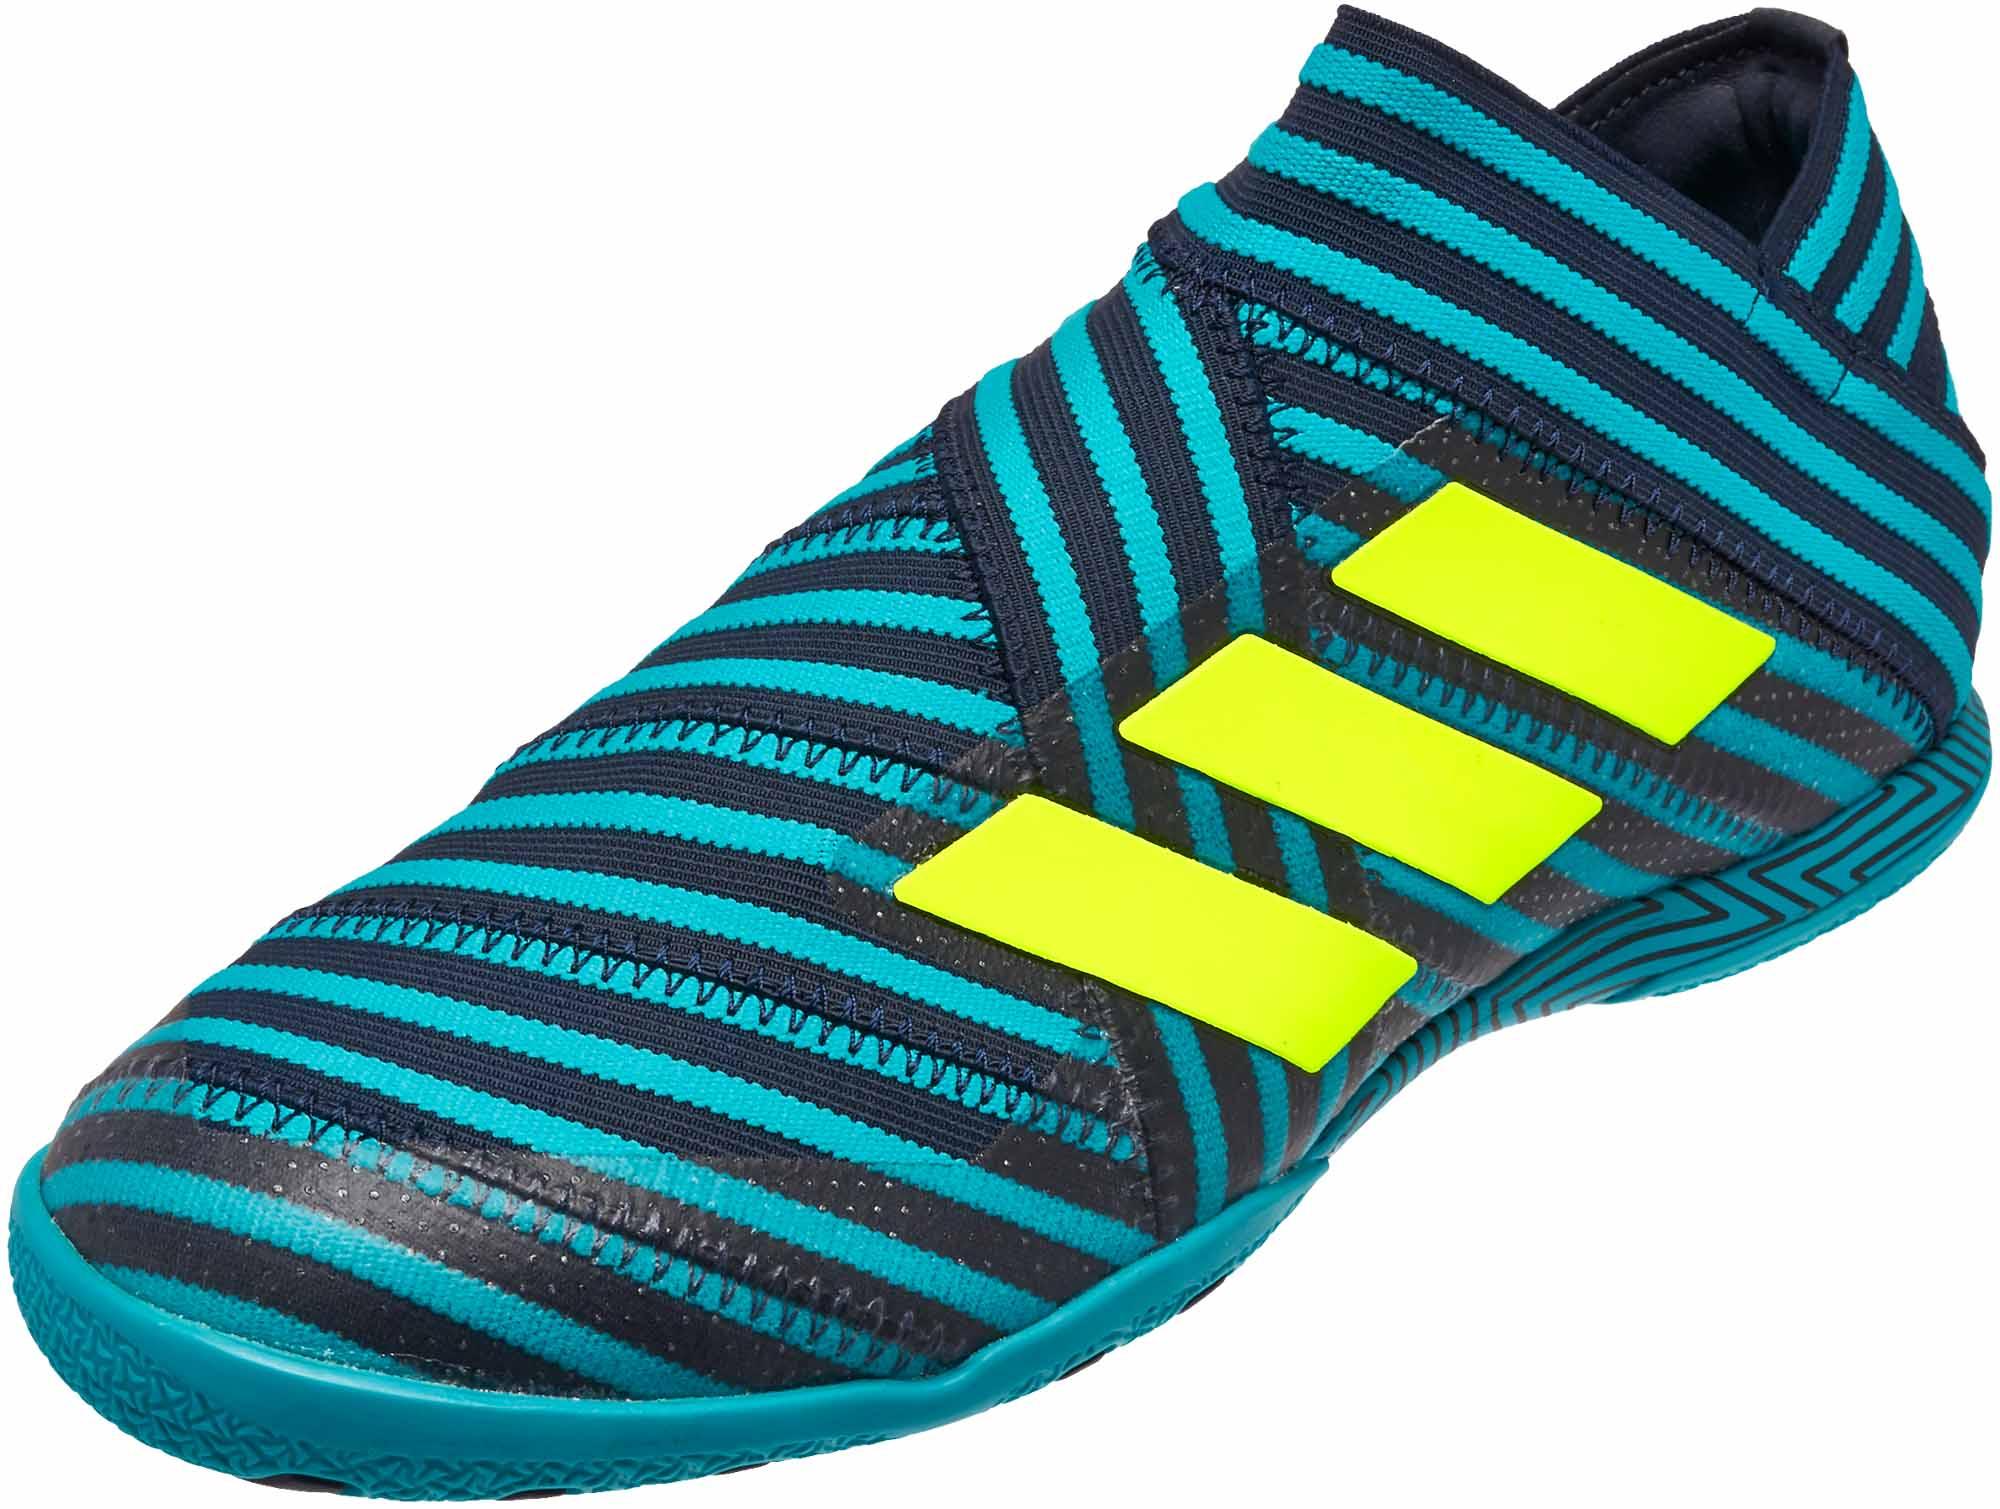 bdc160ae2ff9 adidas Nemeziz Tango 17+ 360Agility - Legend Ink & Solar Yellow ...